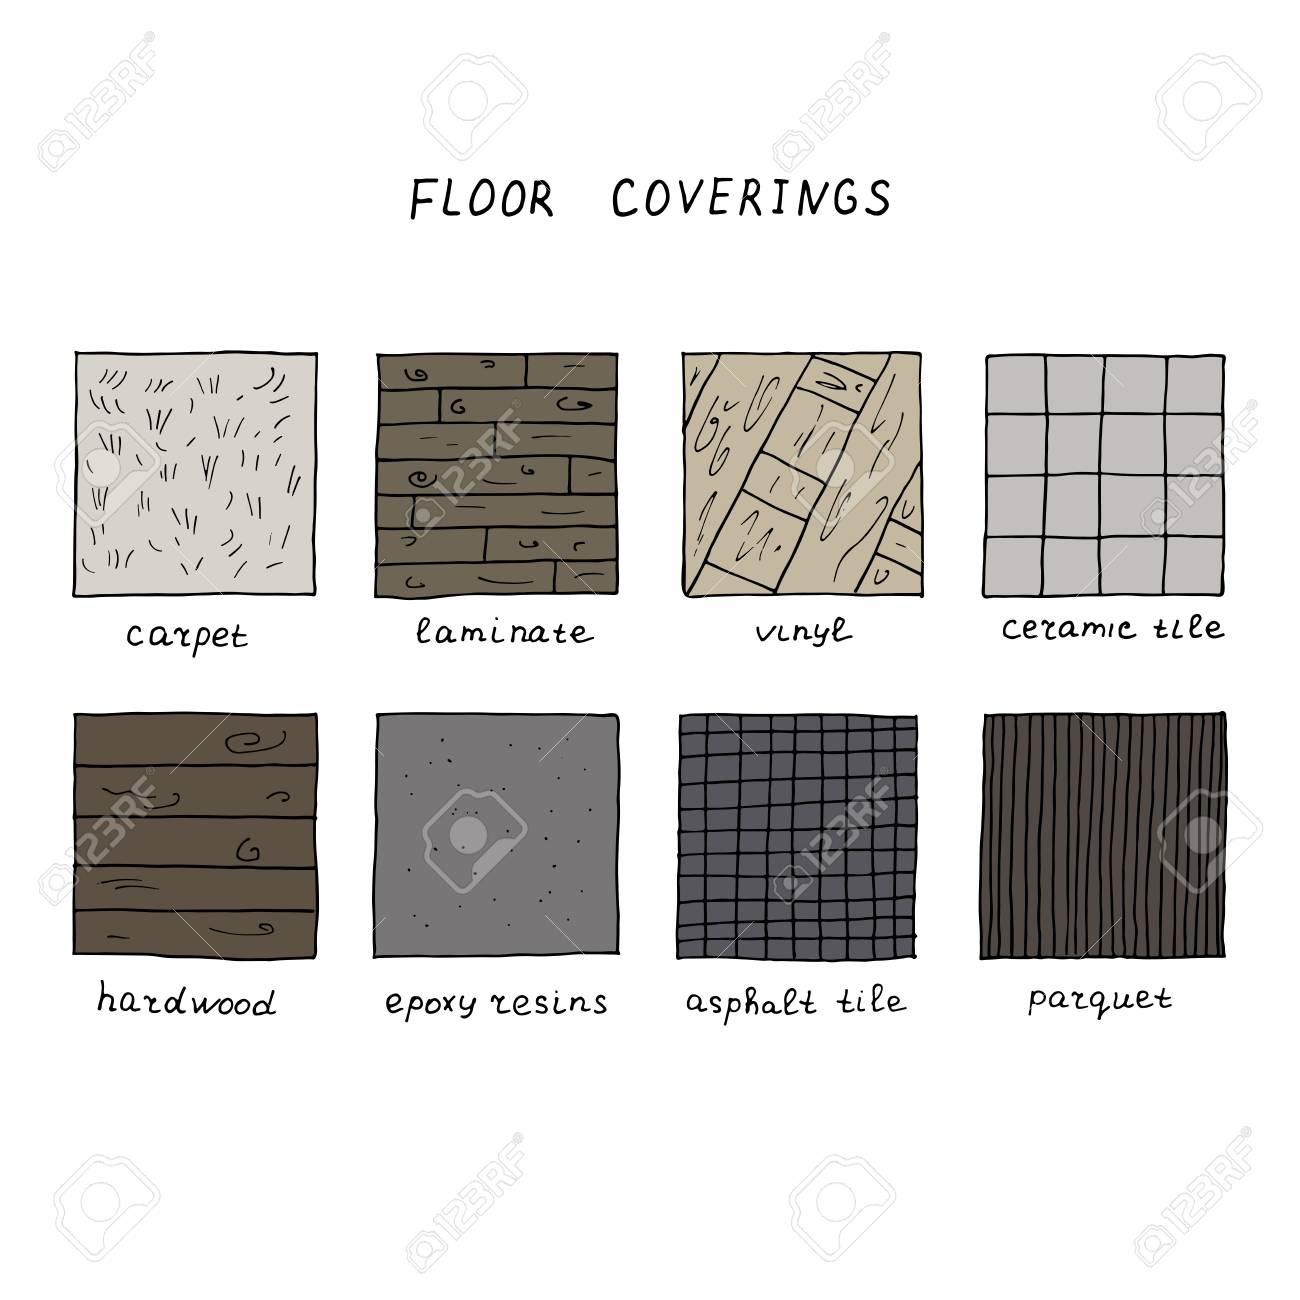 hand drawn floor coverings carpet laminate vinyl ceramic